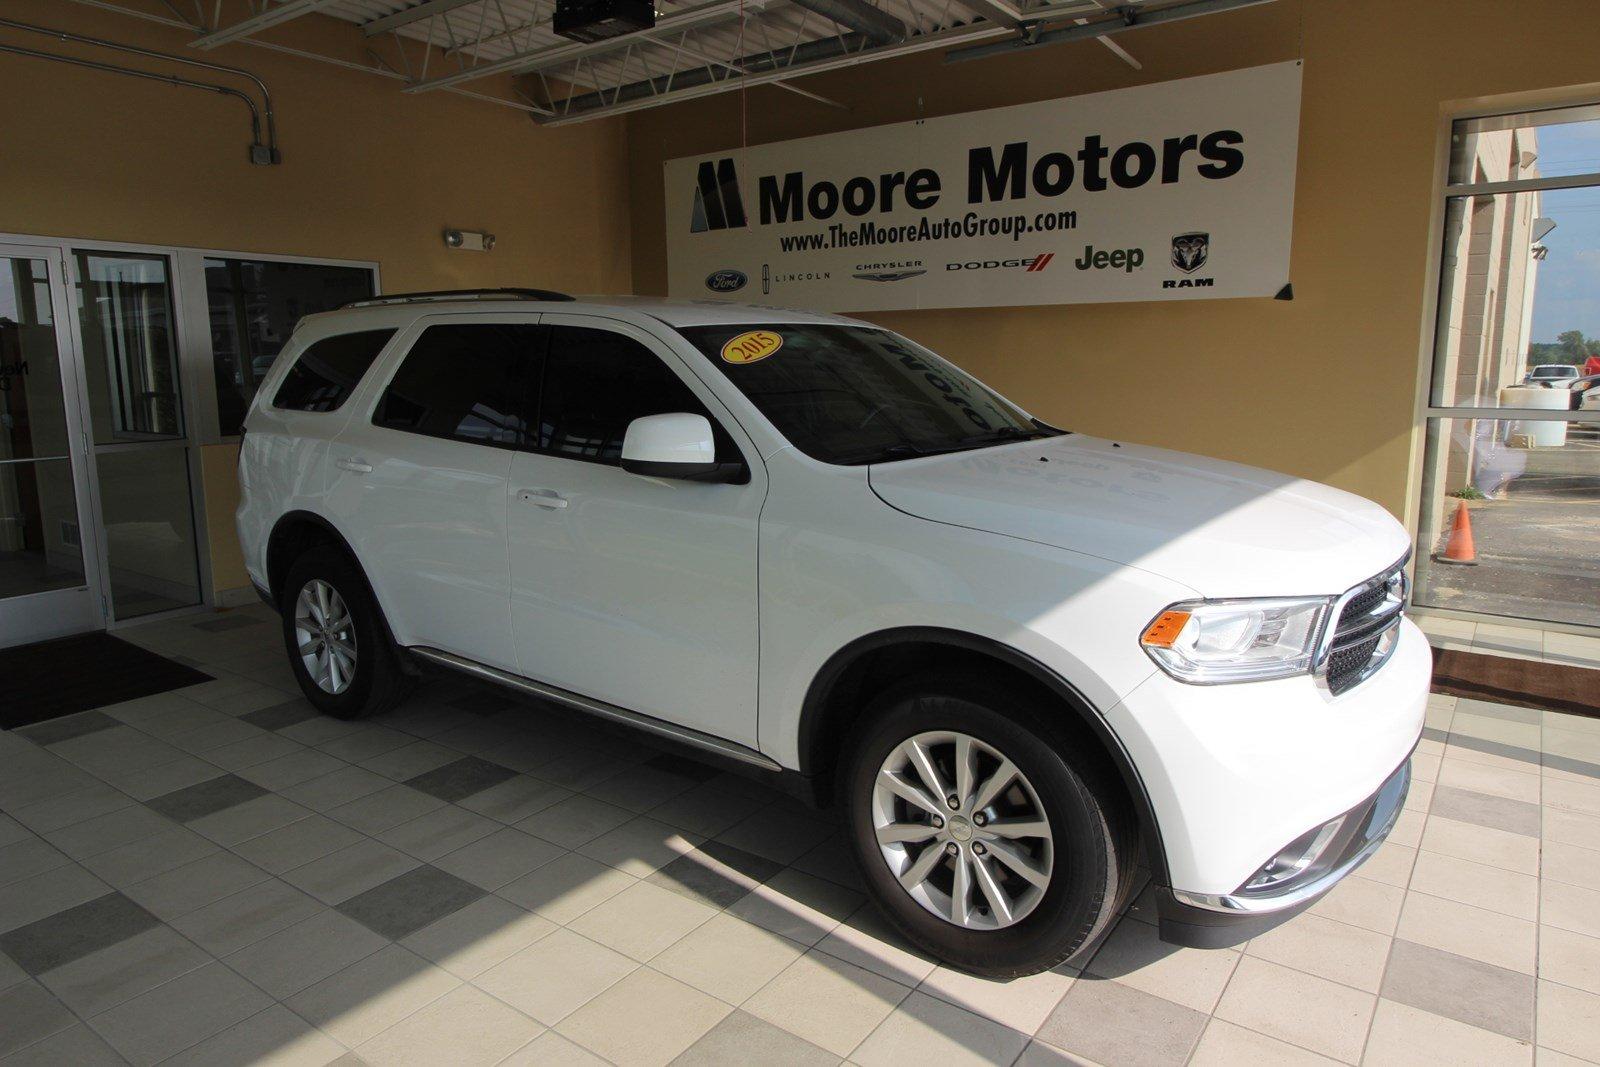 2015 Dodge Durango SXT SUV 1C4RDJAG1FC832905